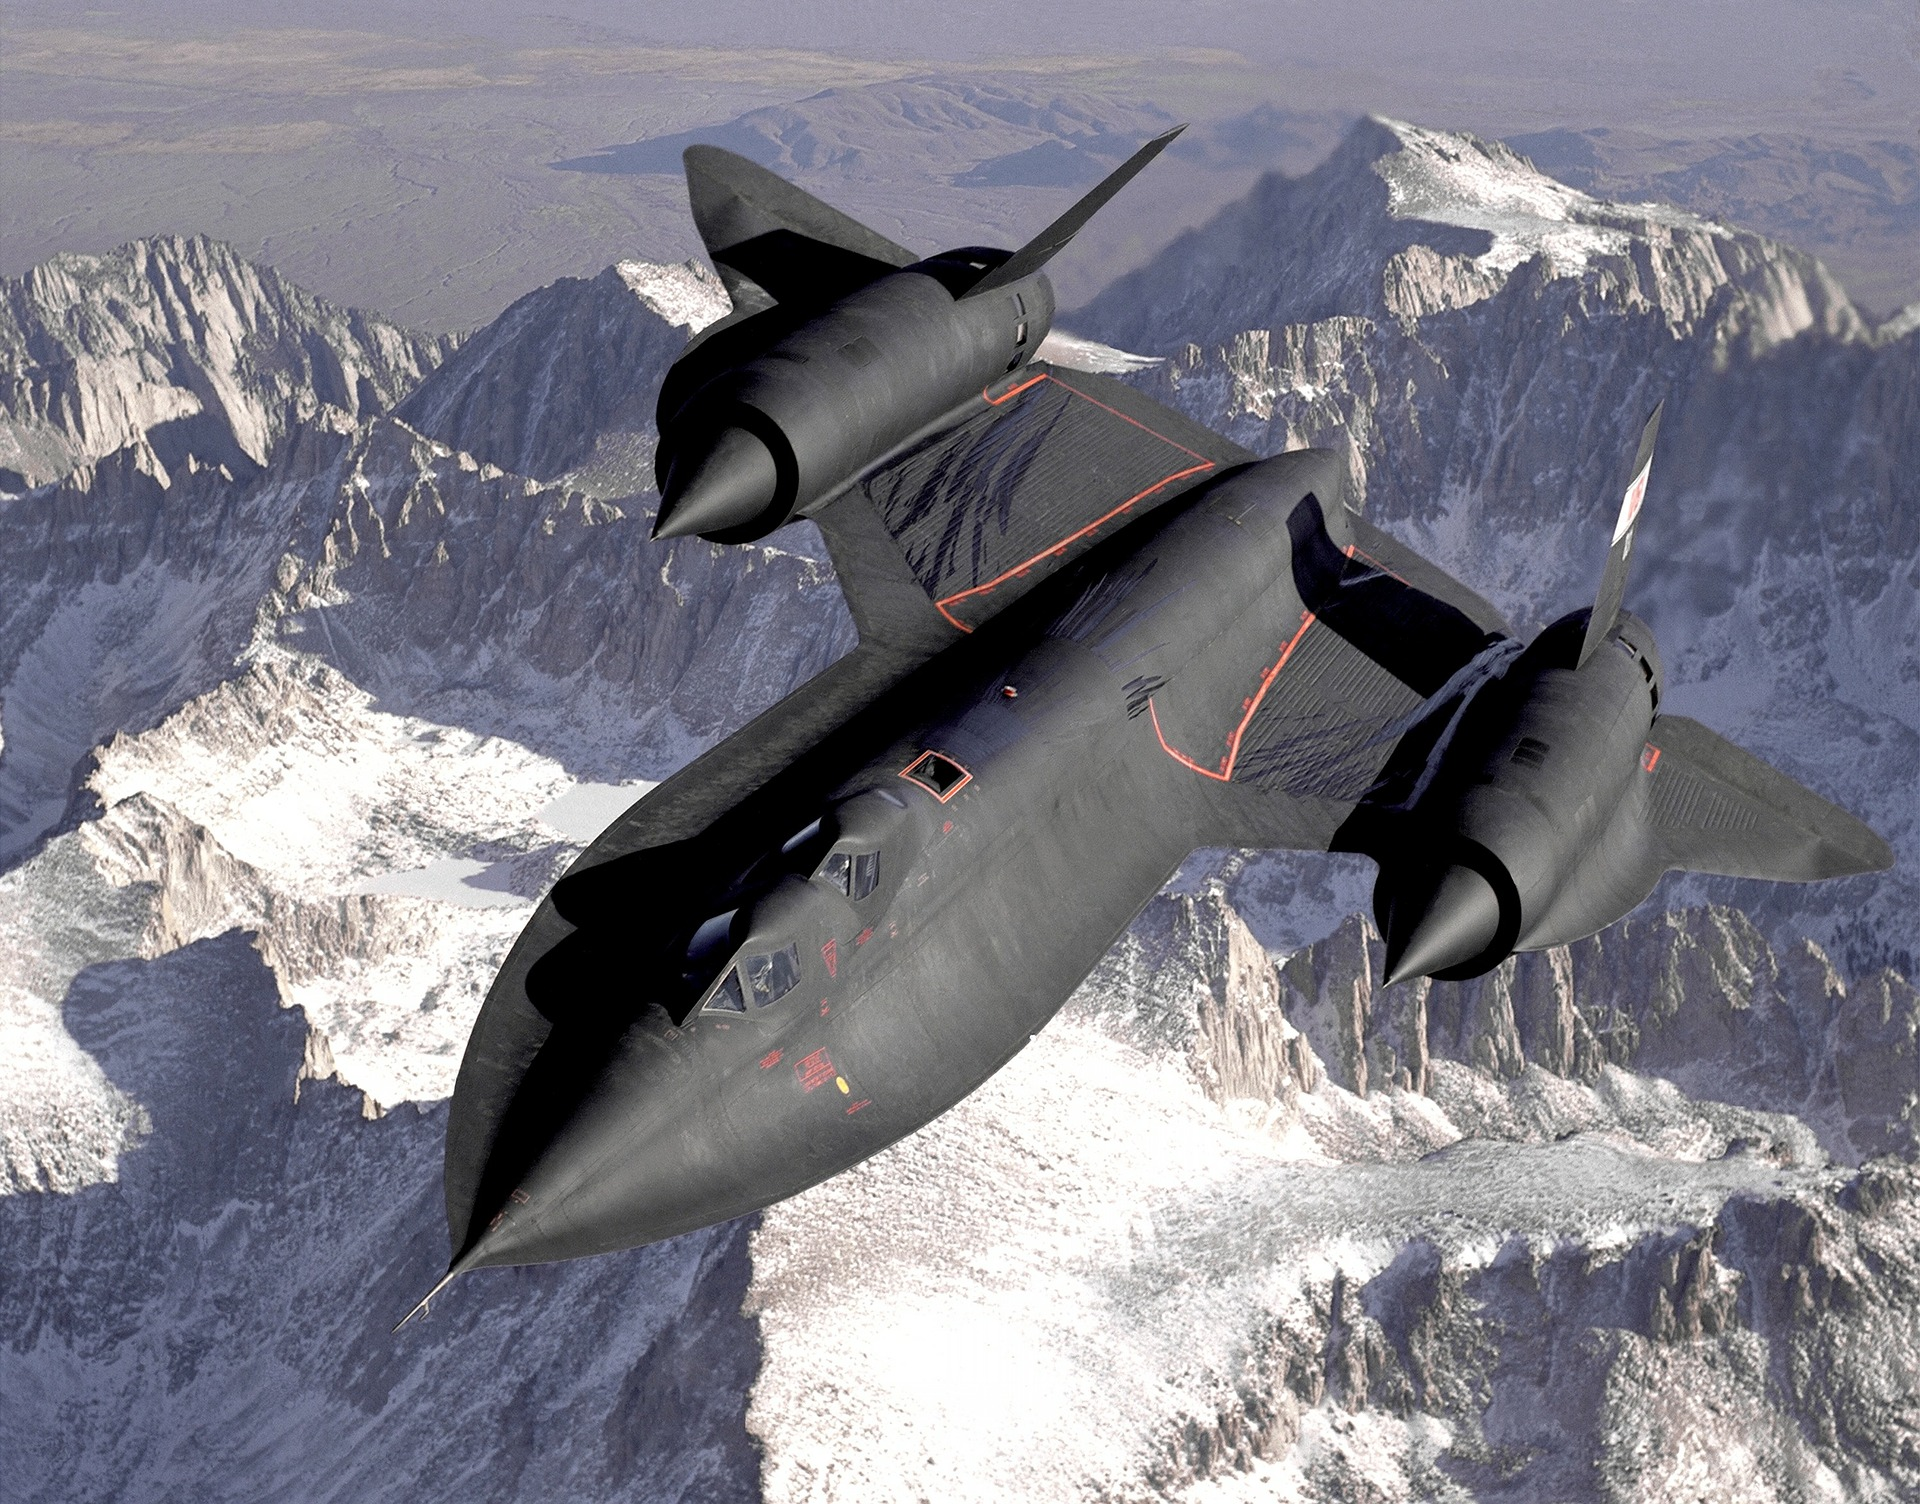 avión, supersonique, Jet, Blackbird, avion - Fonds d'écran HD - Professor-falken.com